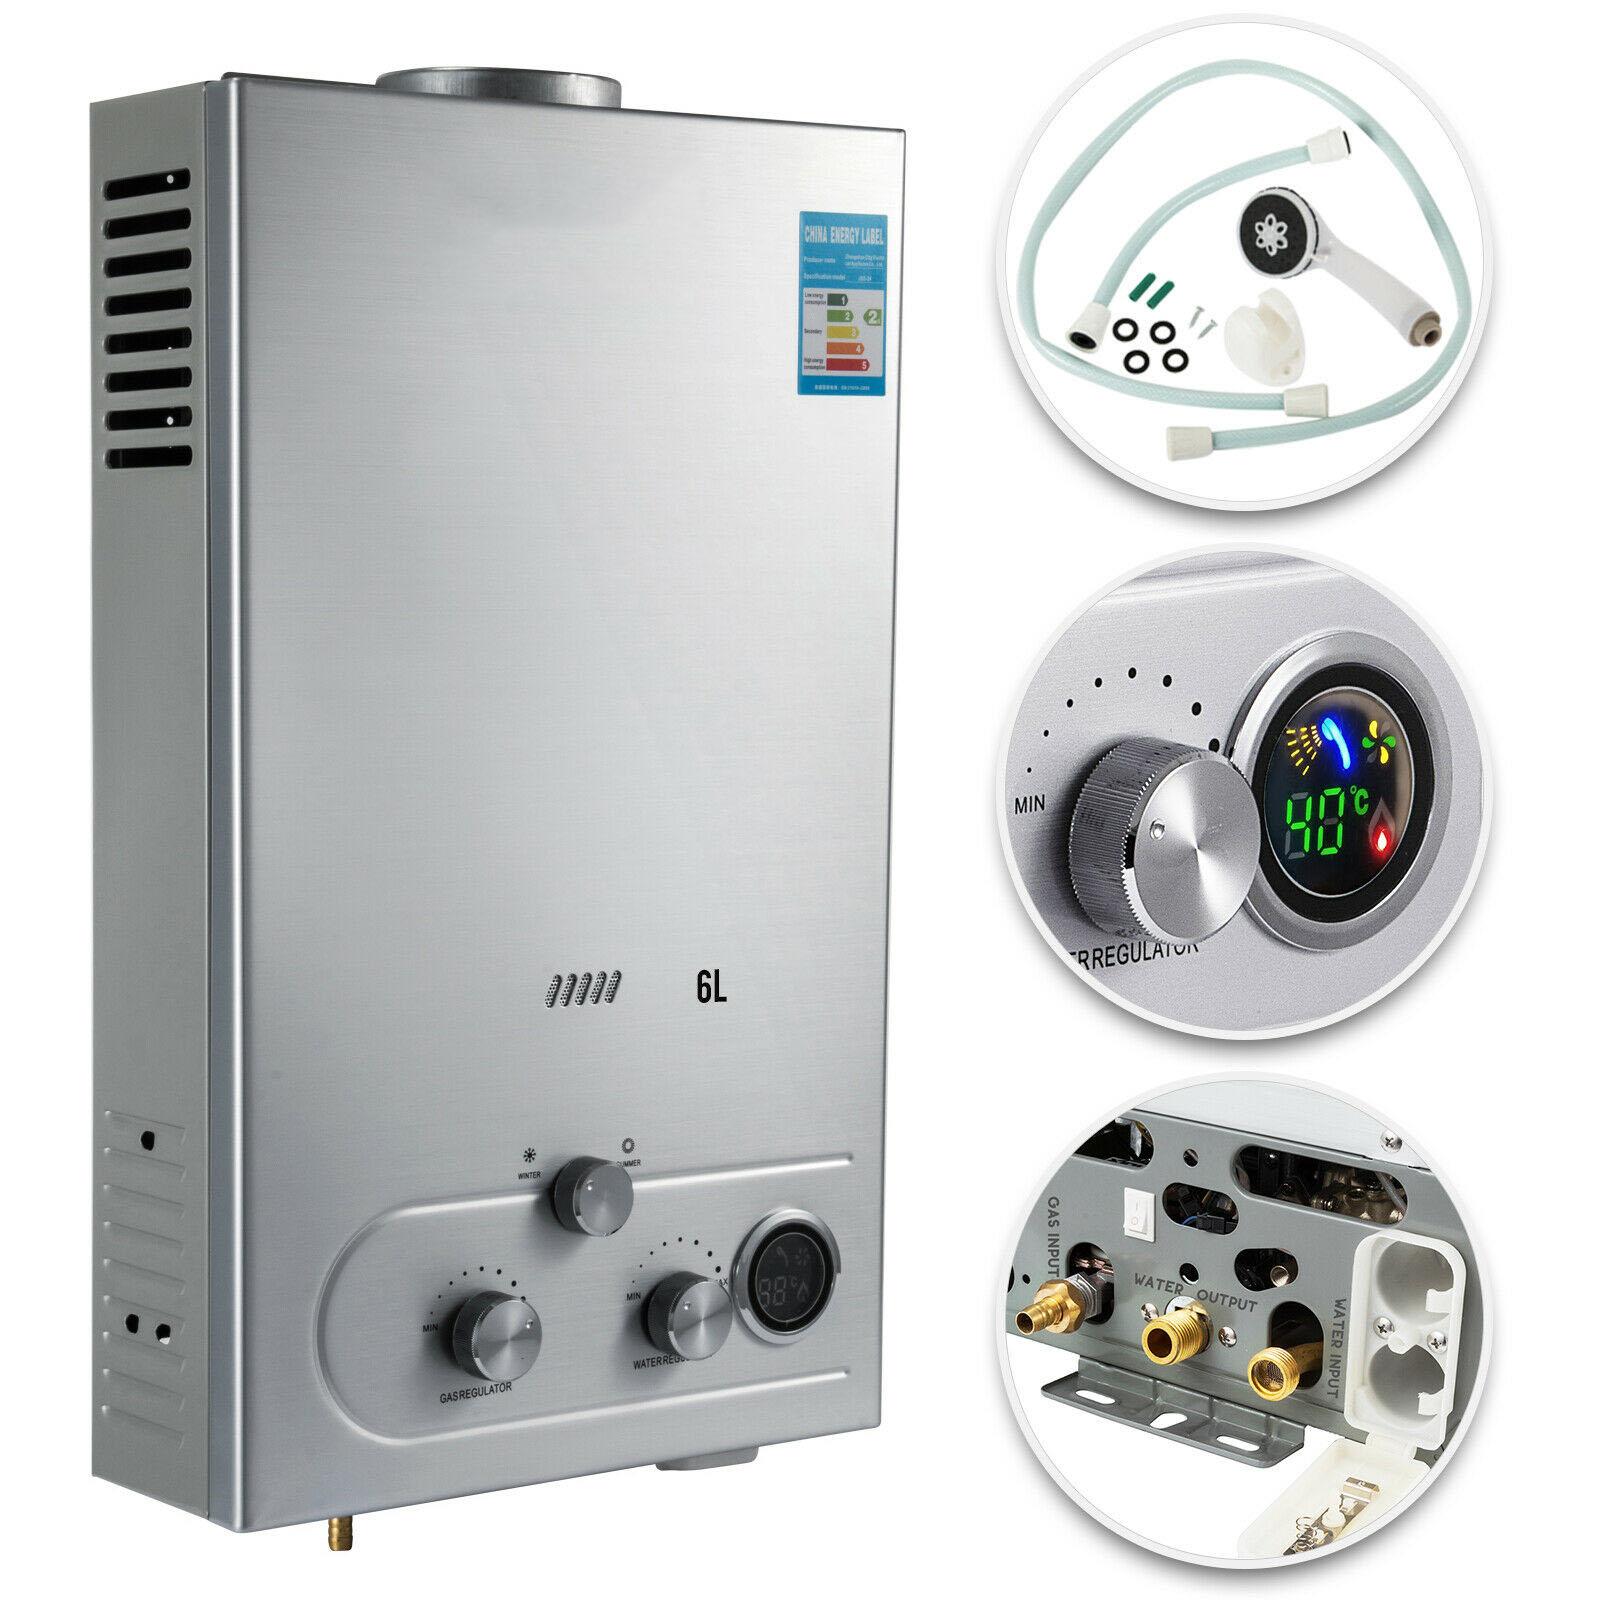 6L Hot Water Storage Gas Water Heater Propane Gas Water Heater Boiler